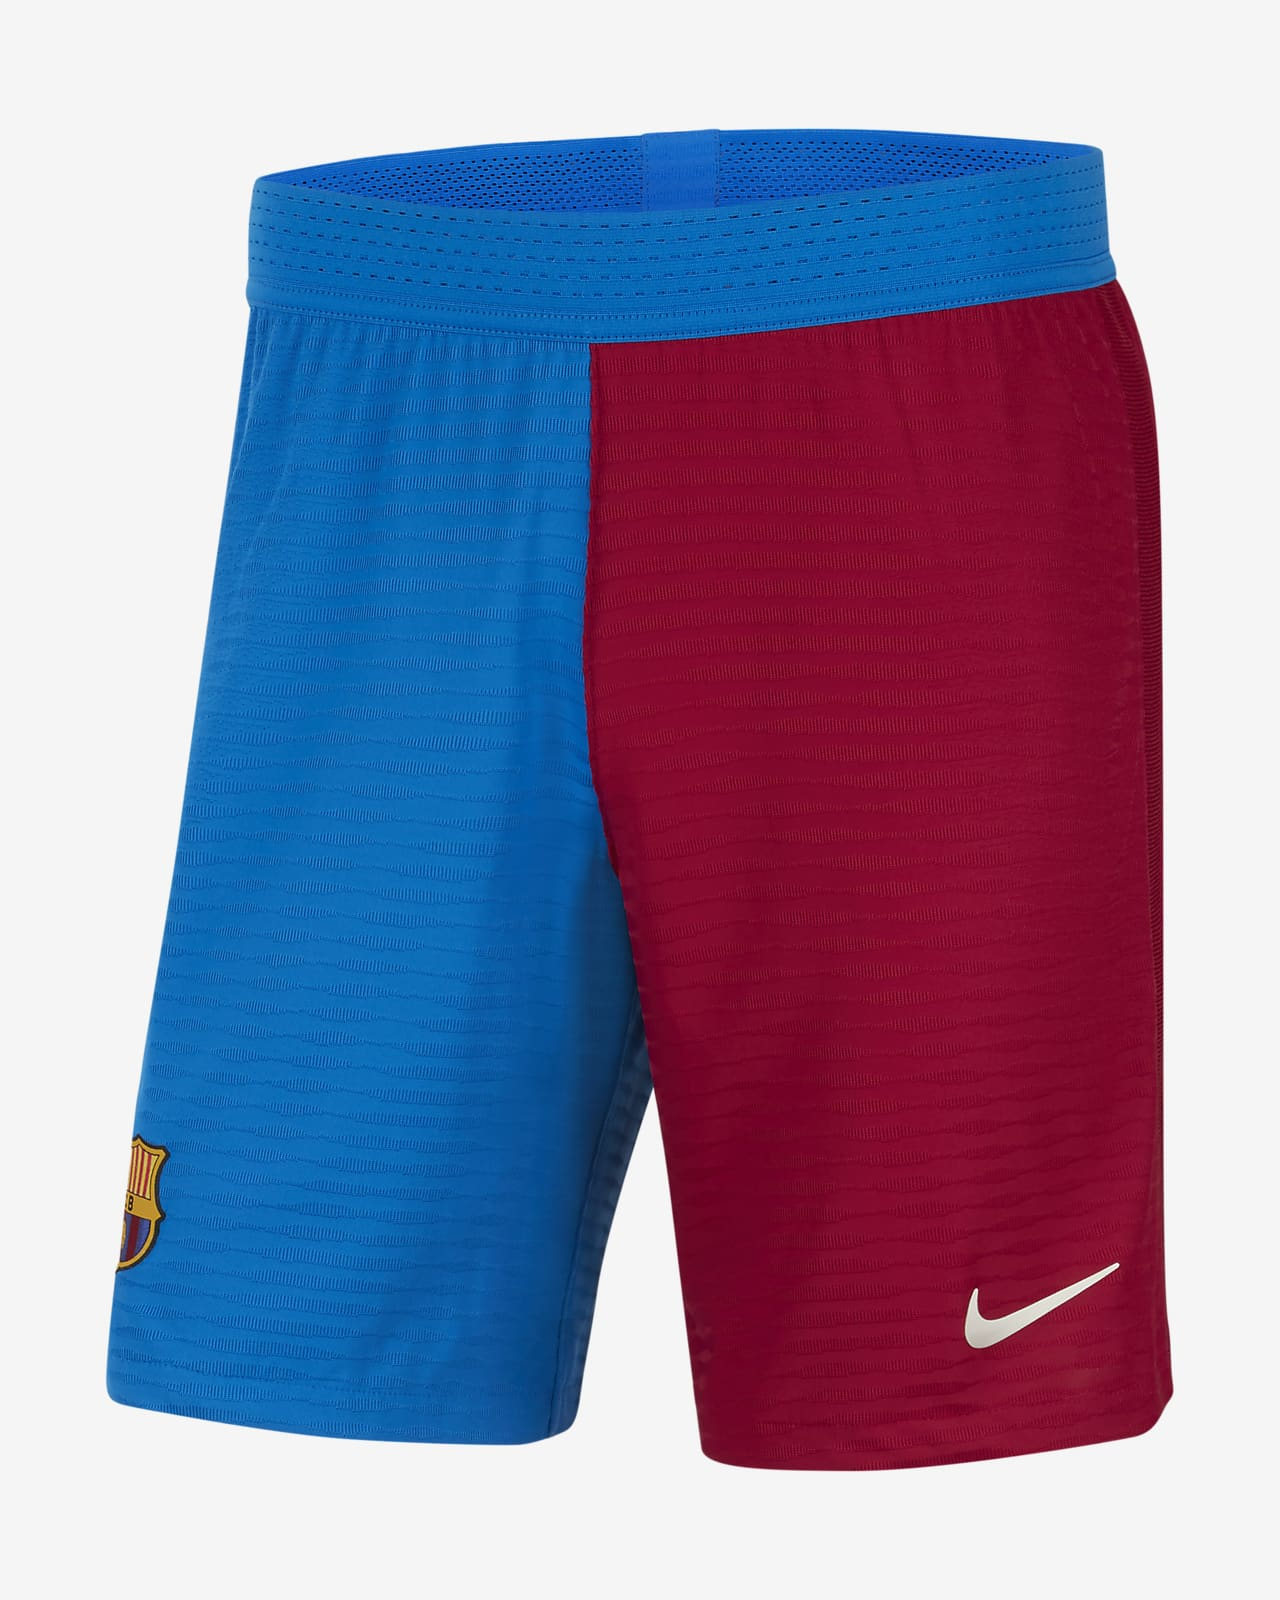 F.C. Barcelona 2021/22 Match Home/Away Men's Nike Dri-FIT ADV Football Shorts